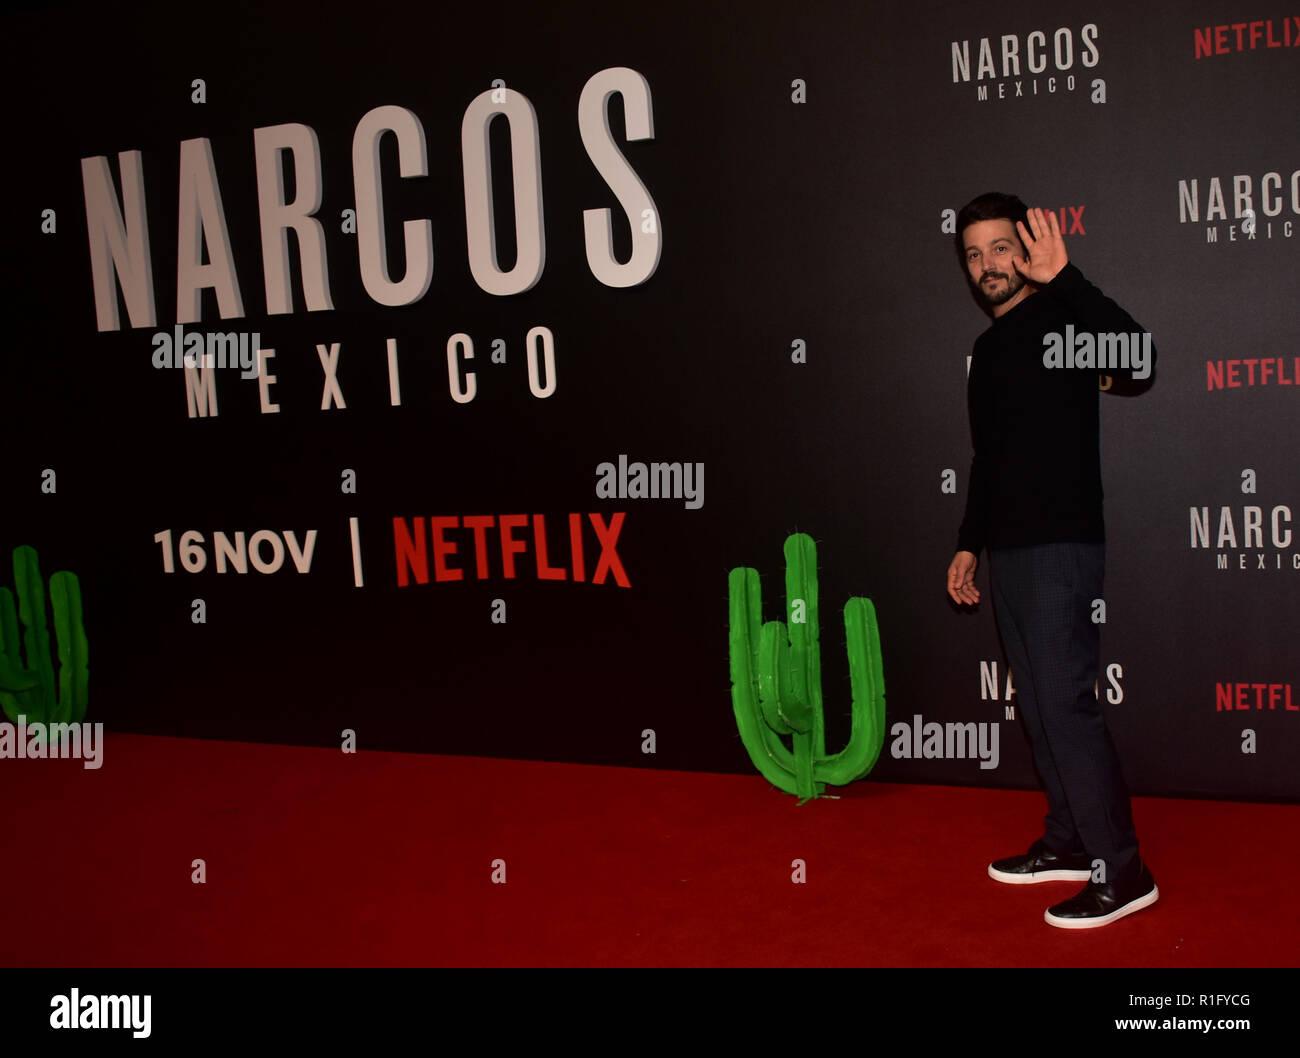 Narcos Series Stock Photos & Narcos Series Stock Images - Alamy